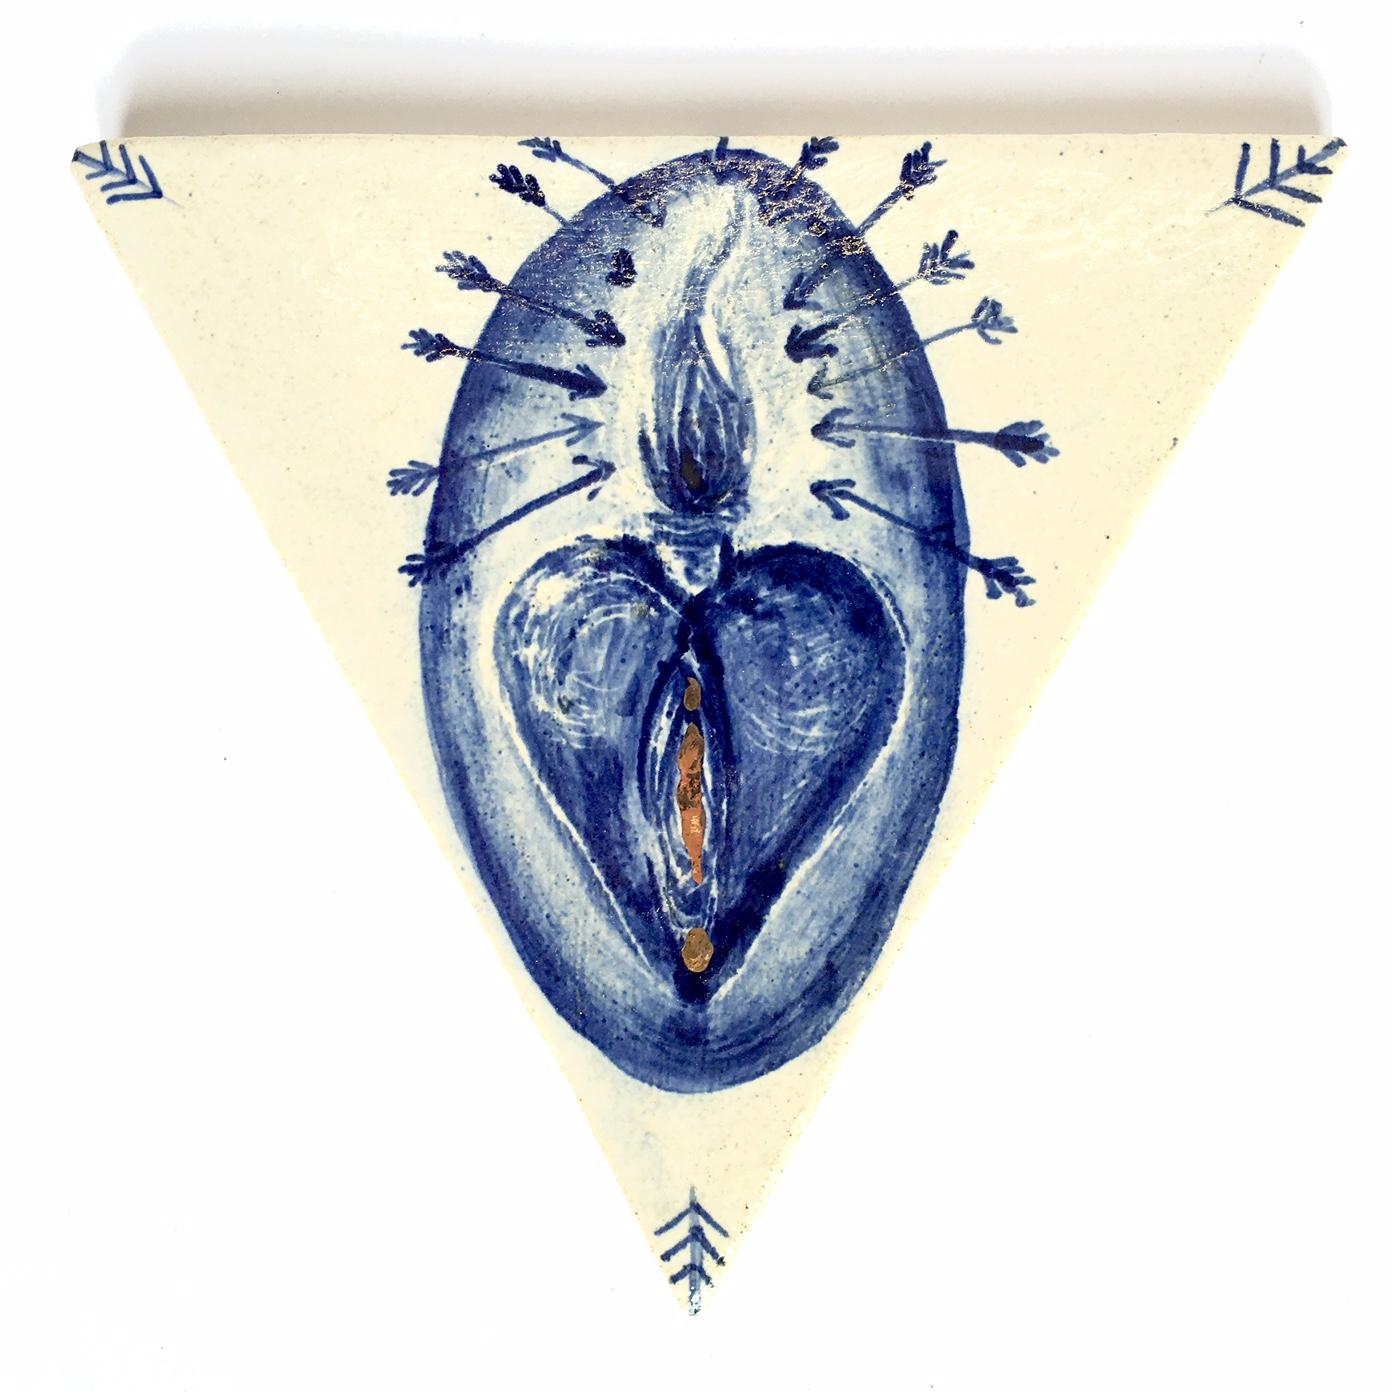 Wondrous Heart